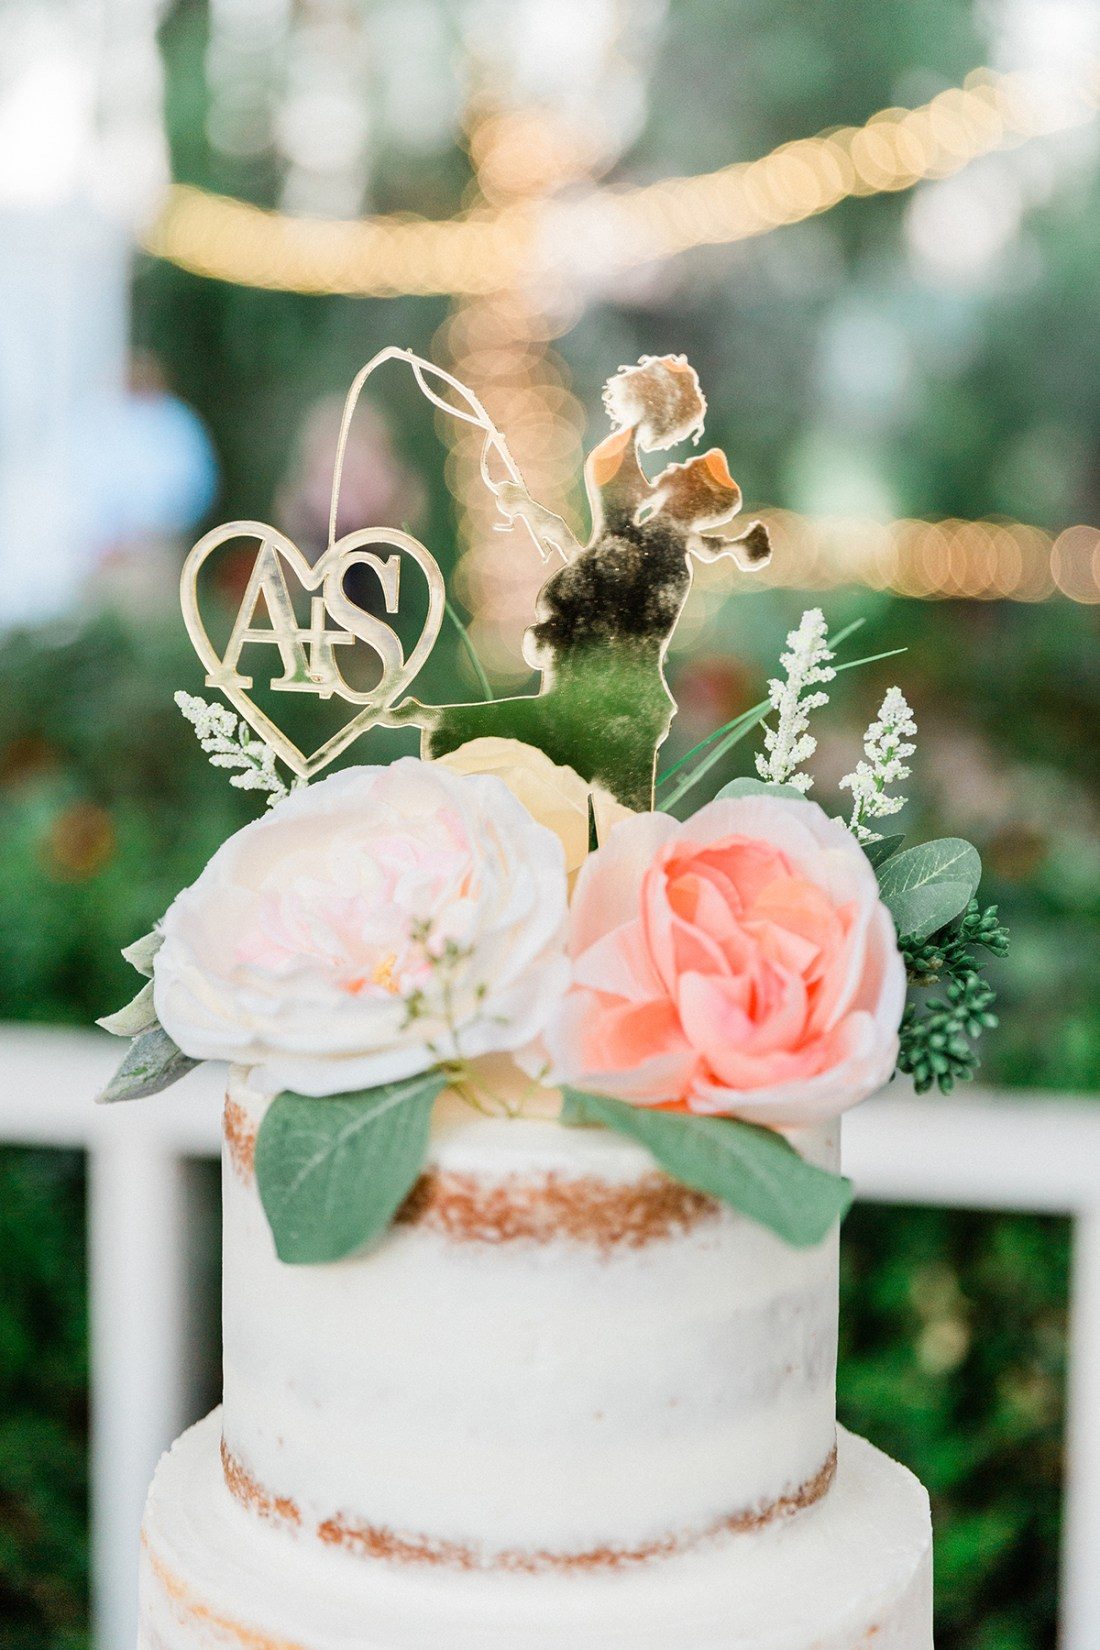 Custom Fishing Wedding Cake Topper | A Good Hue